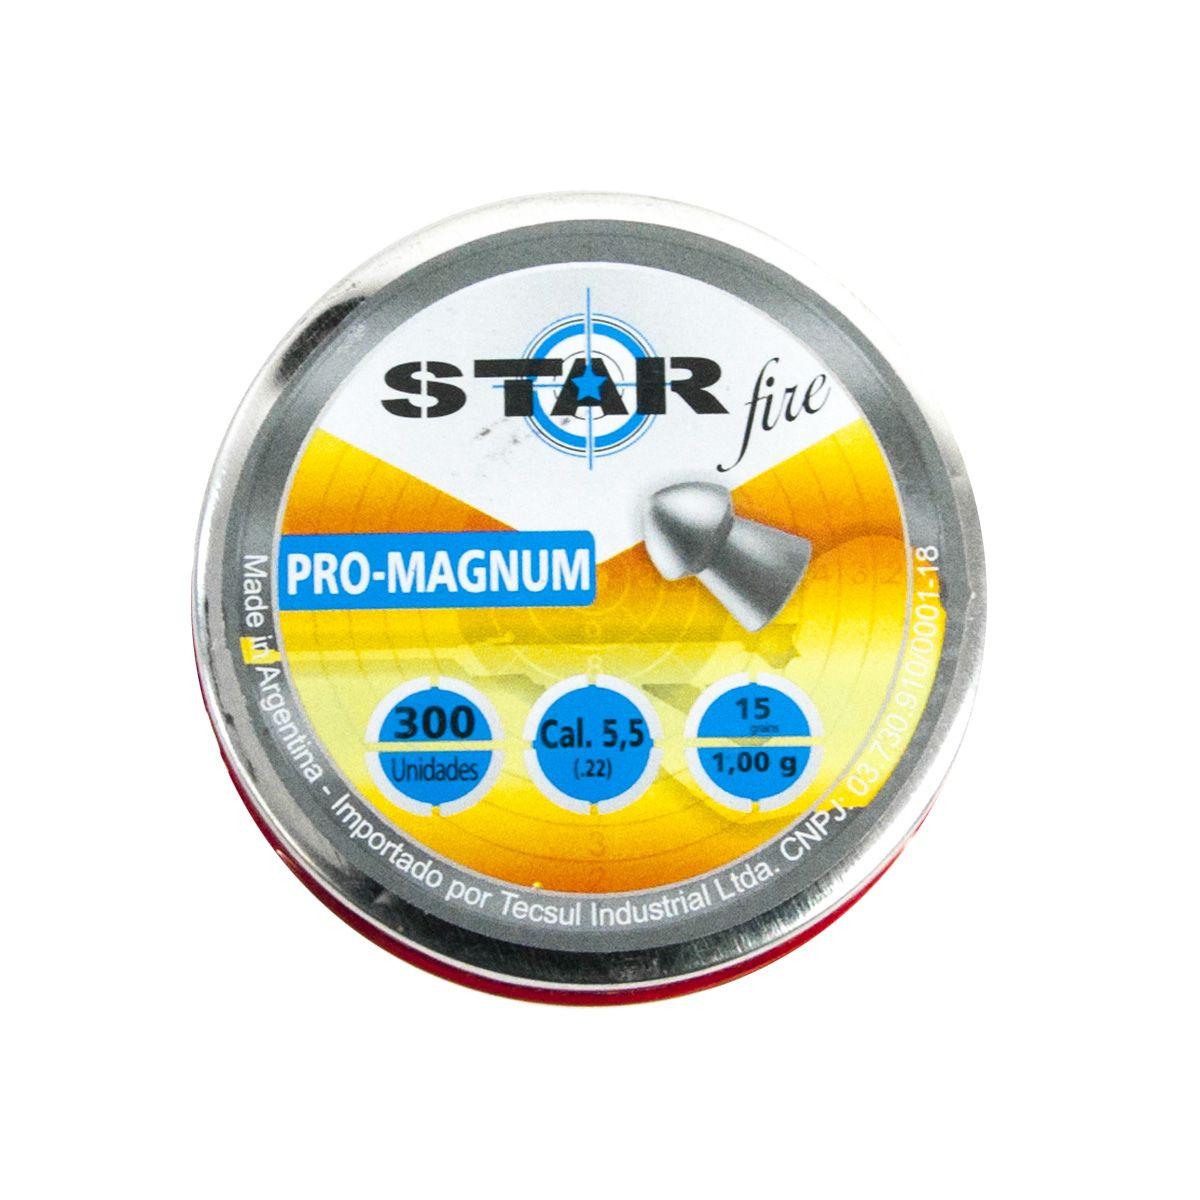 Chumbinho Star Fire Pro Magnum 5,5mm cx 300 unidades